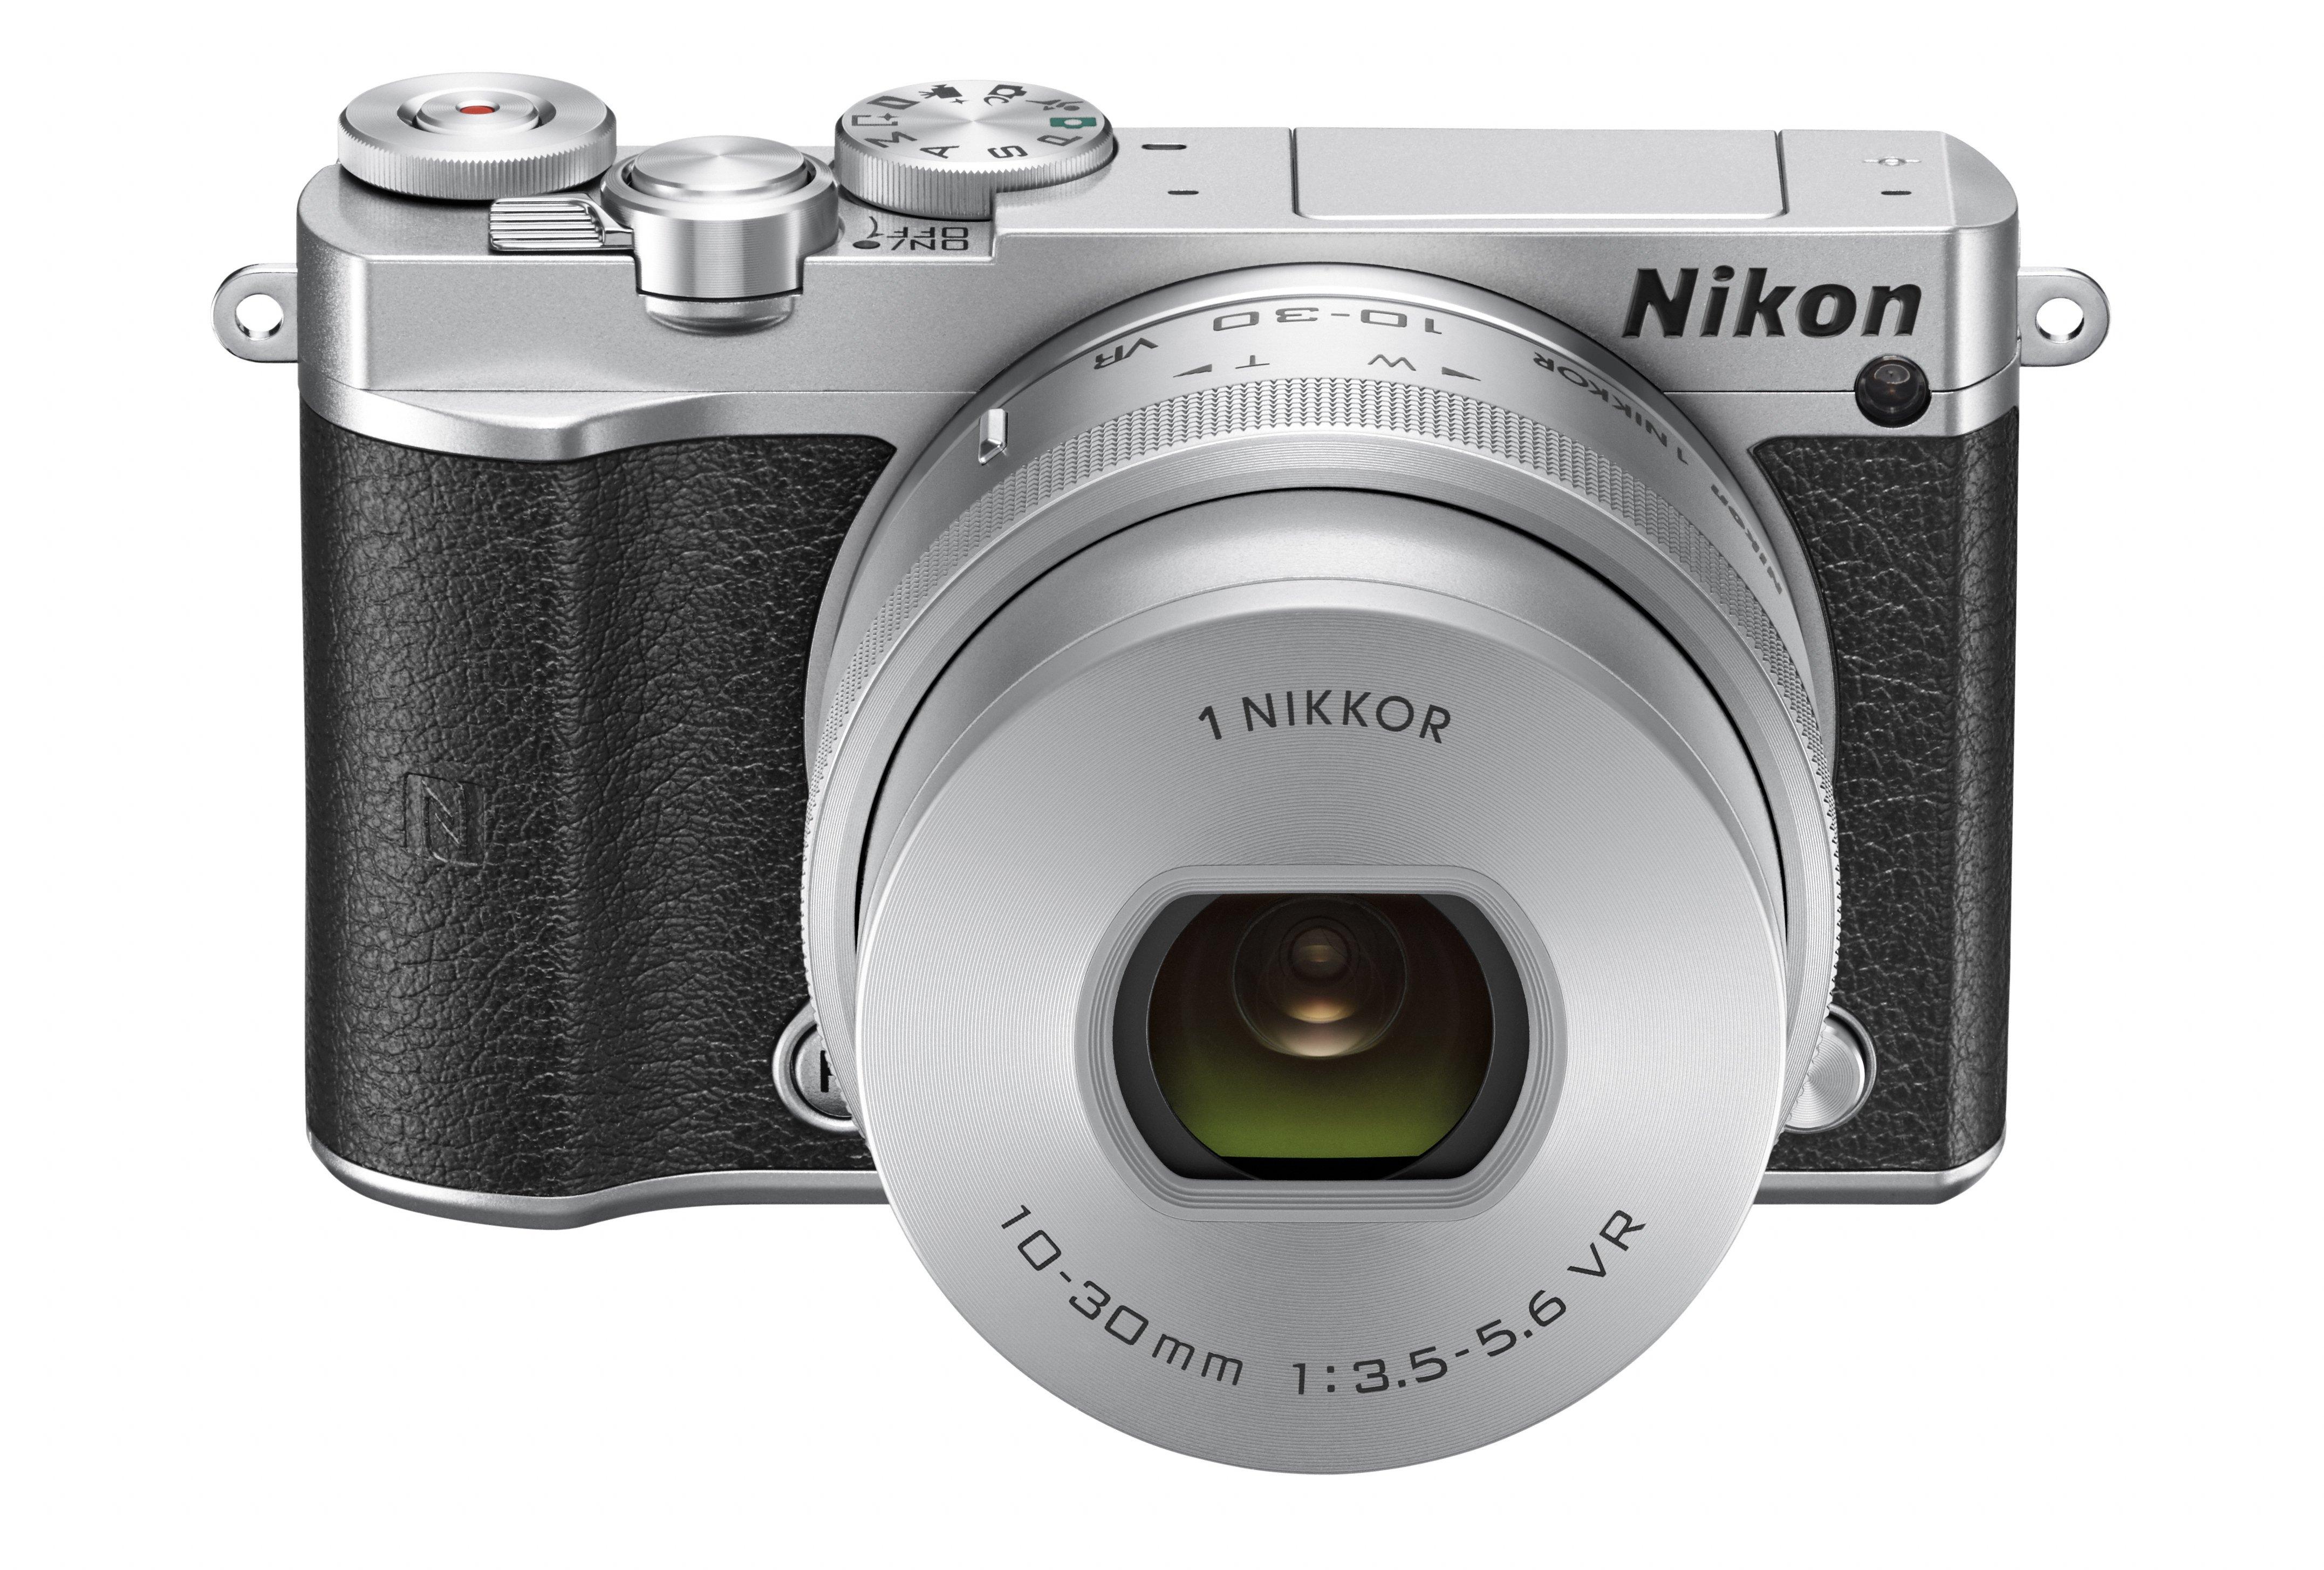 Nikon Announces the Nikon 1 J5, a Compact 20.8 MP, 20 Frames Per ...